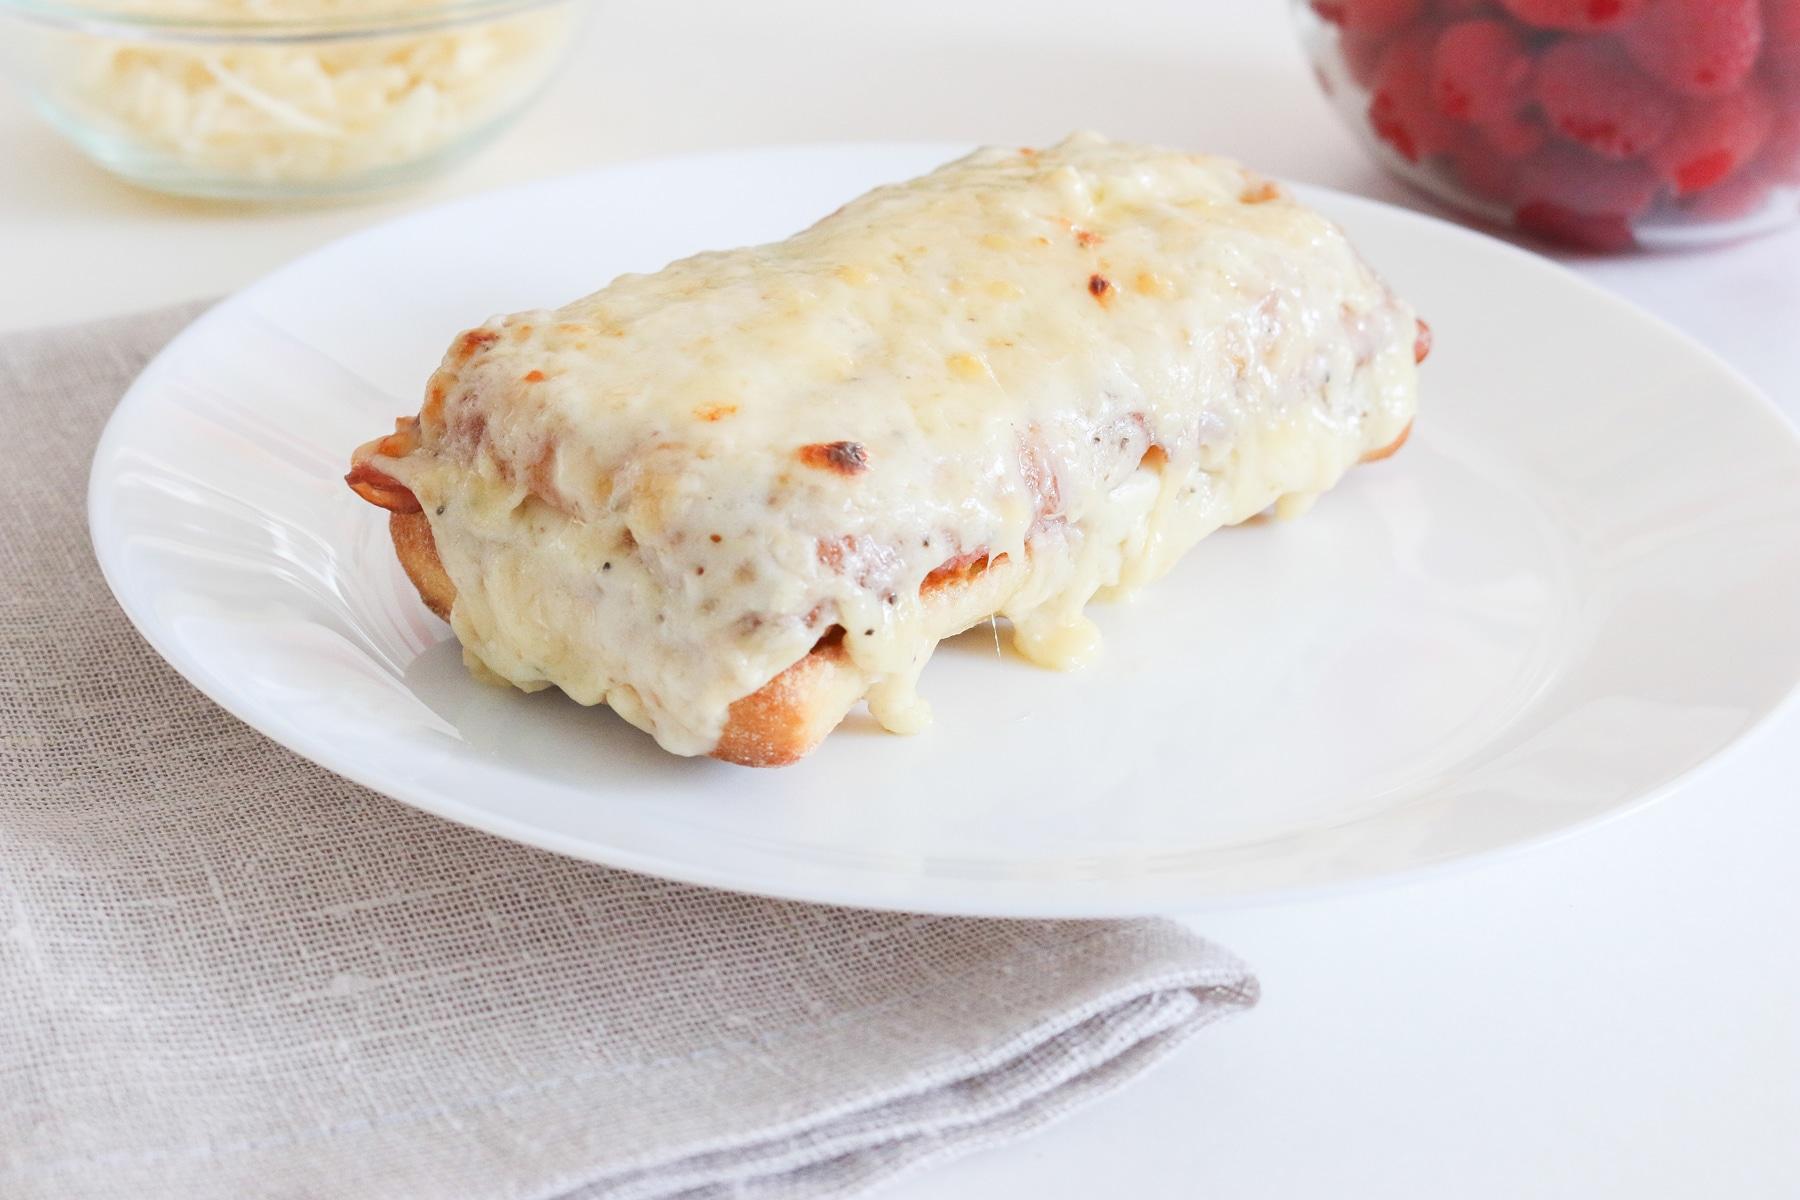 ... cheese sandwich croque madame croque monsieur ham and cheese sandwich